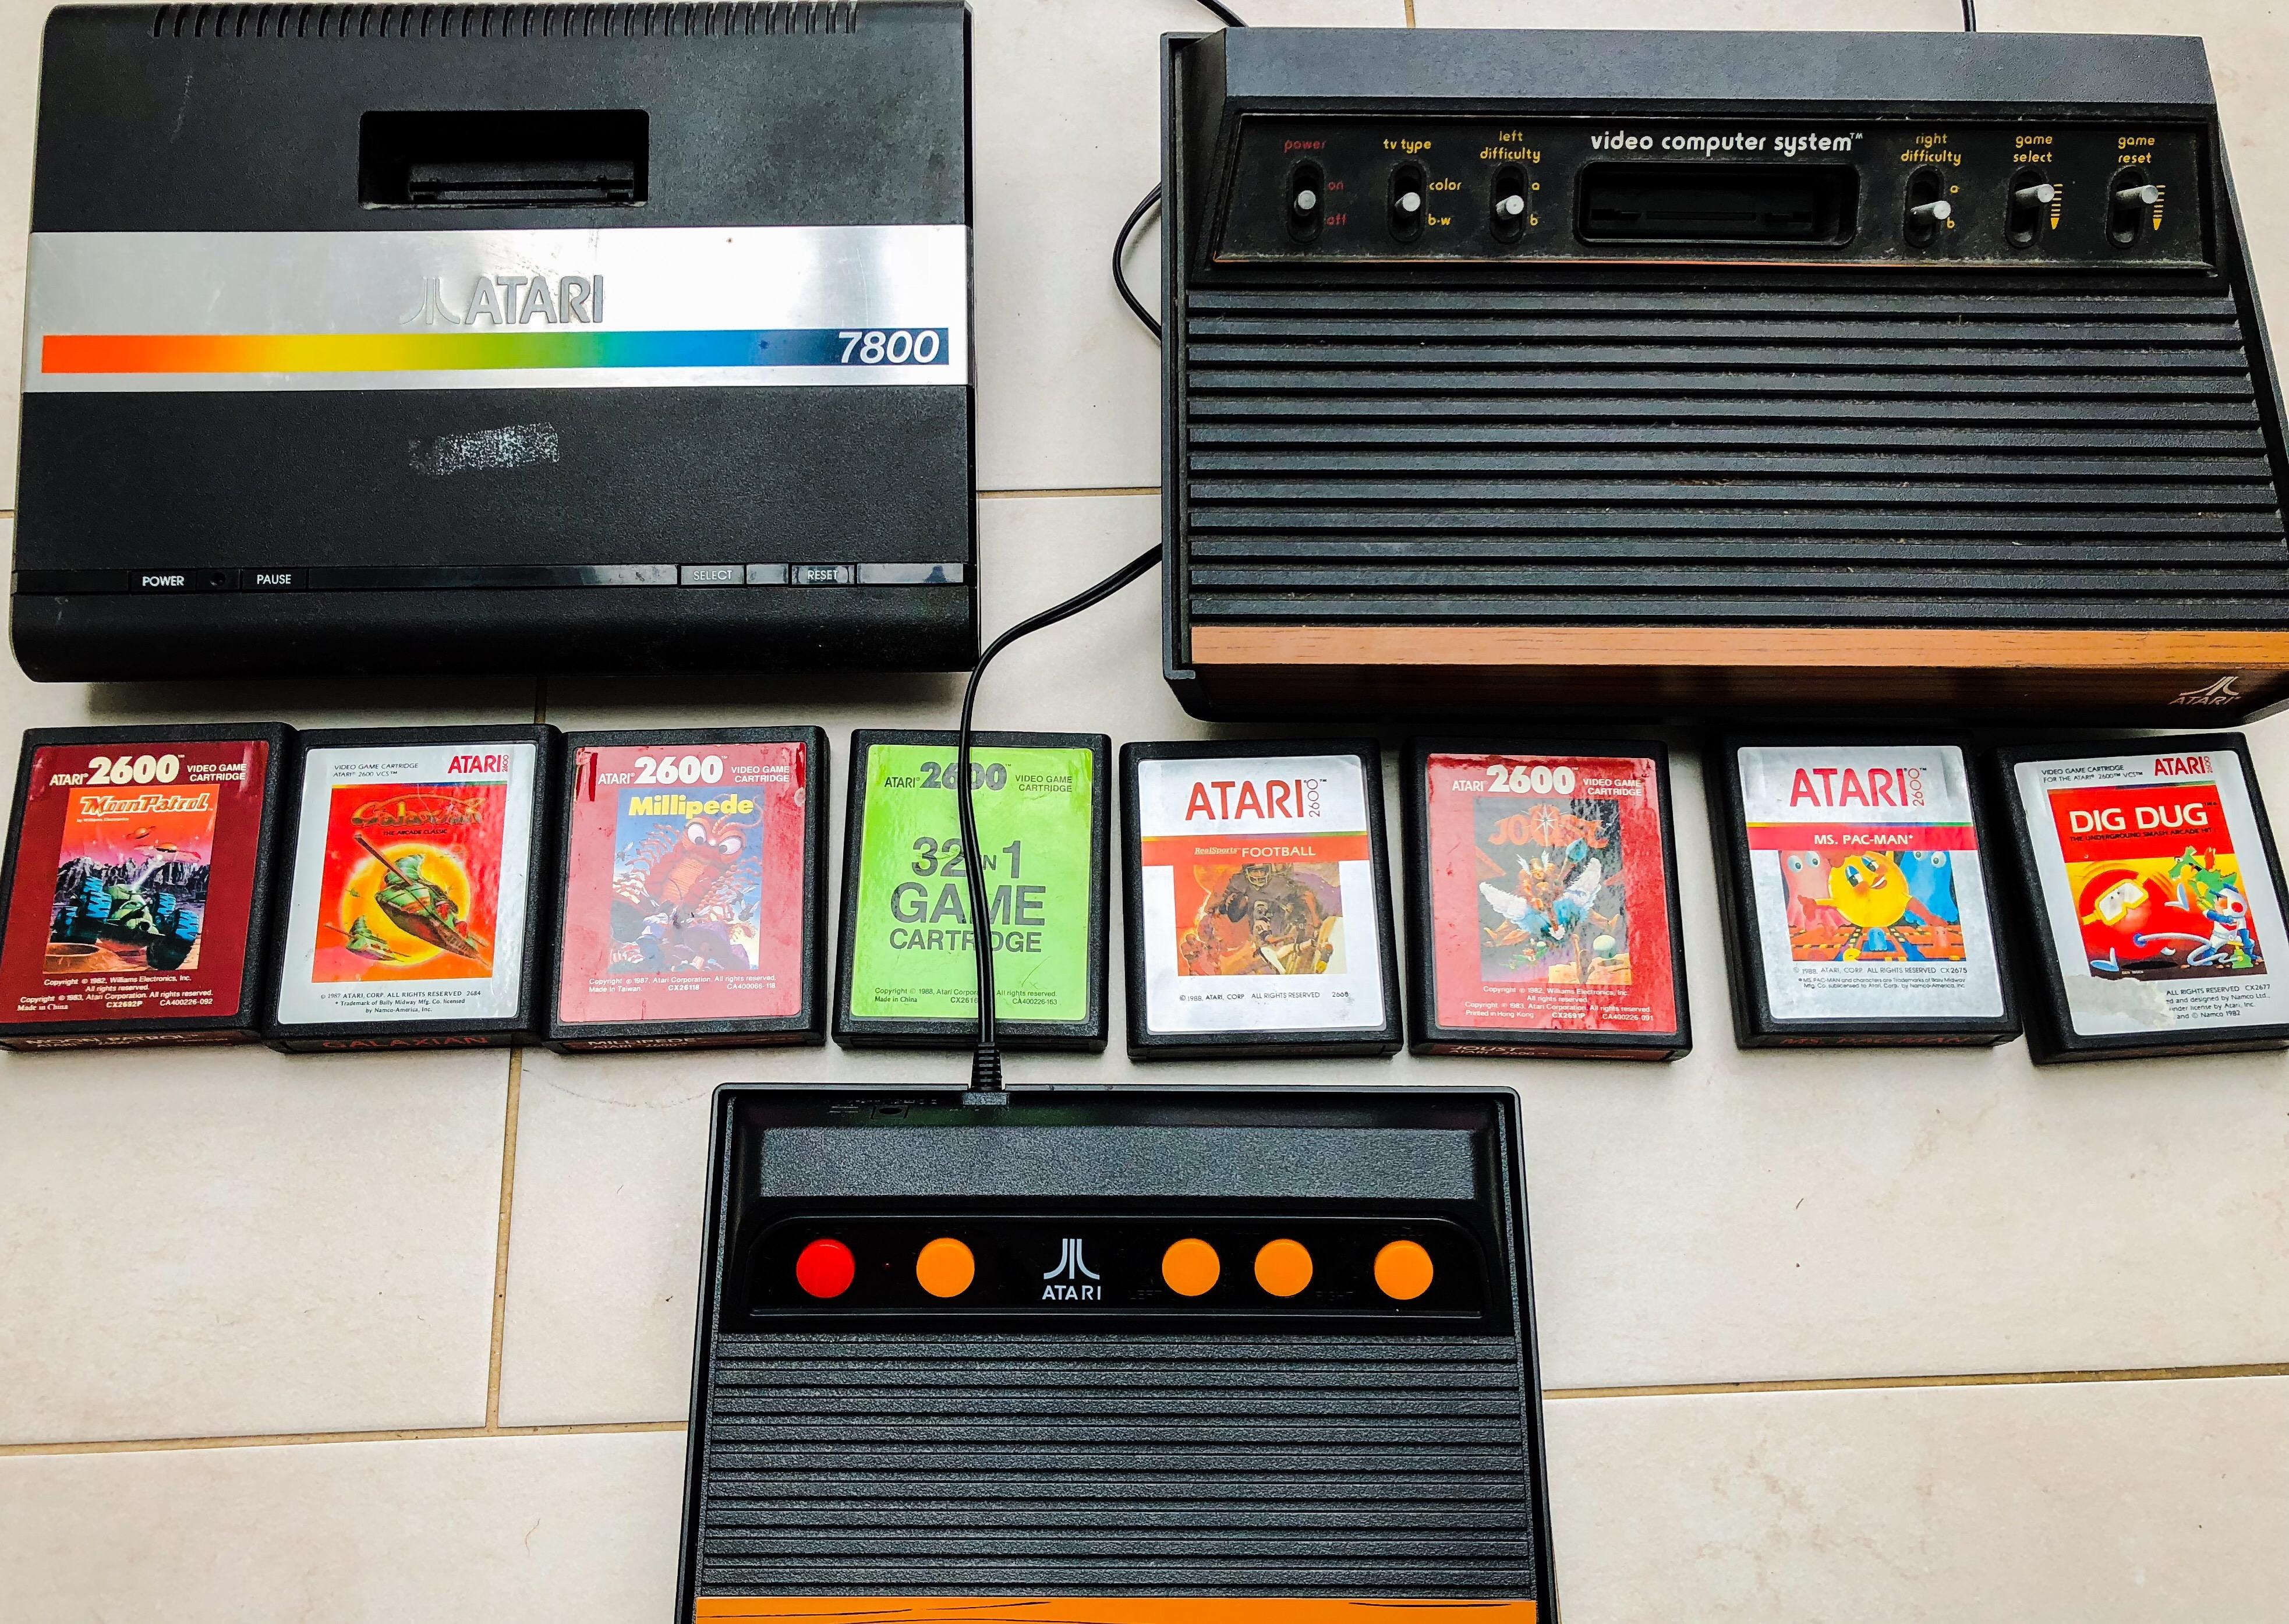 Atari Impressionen